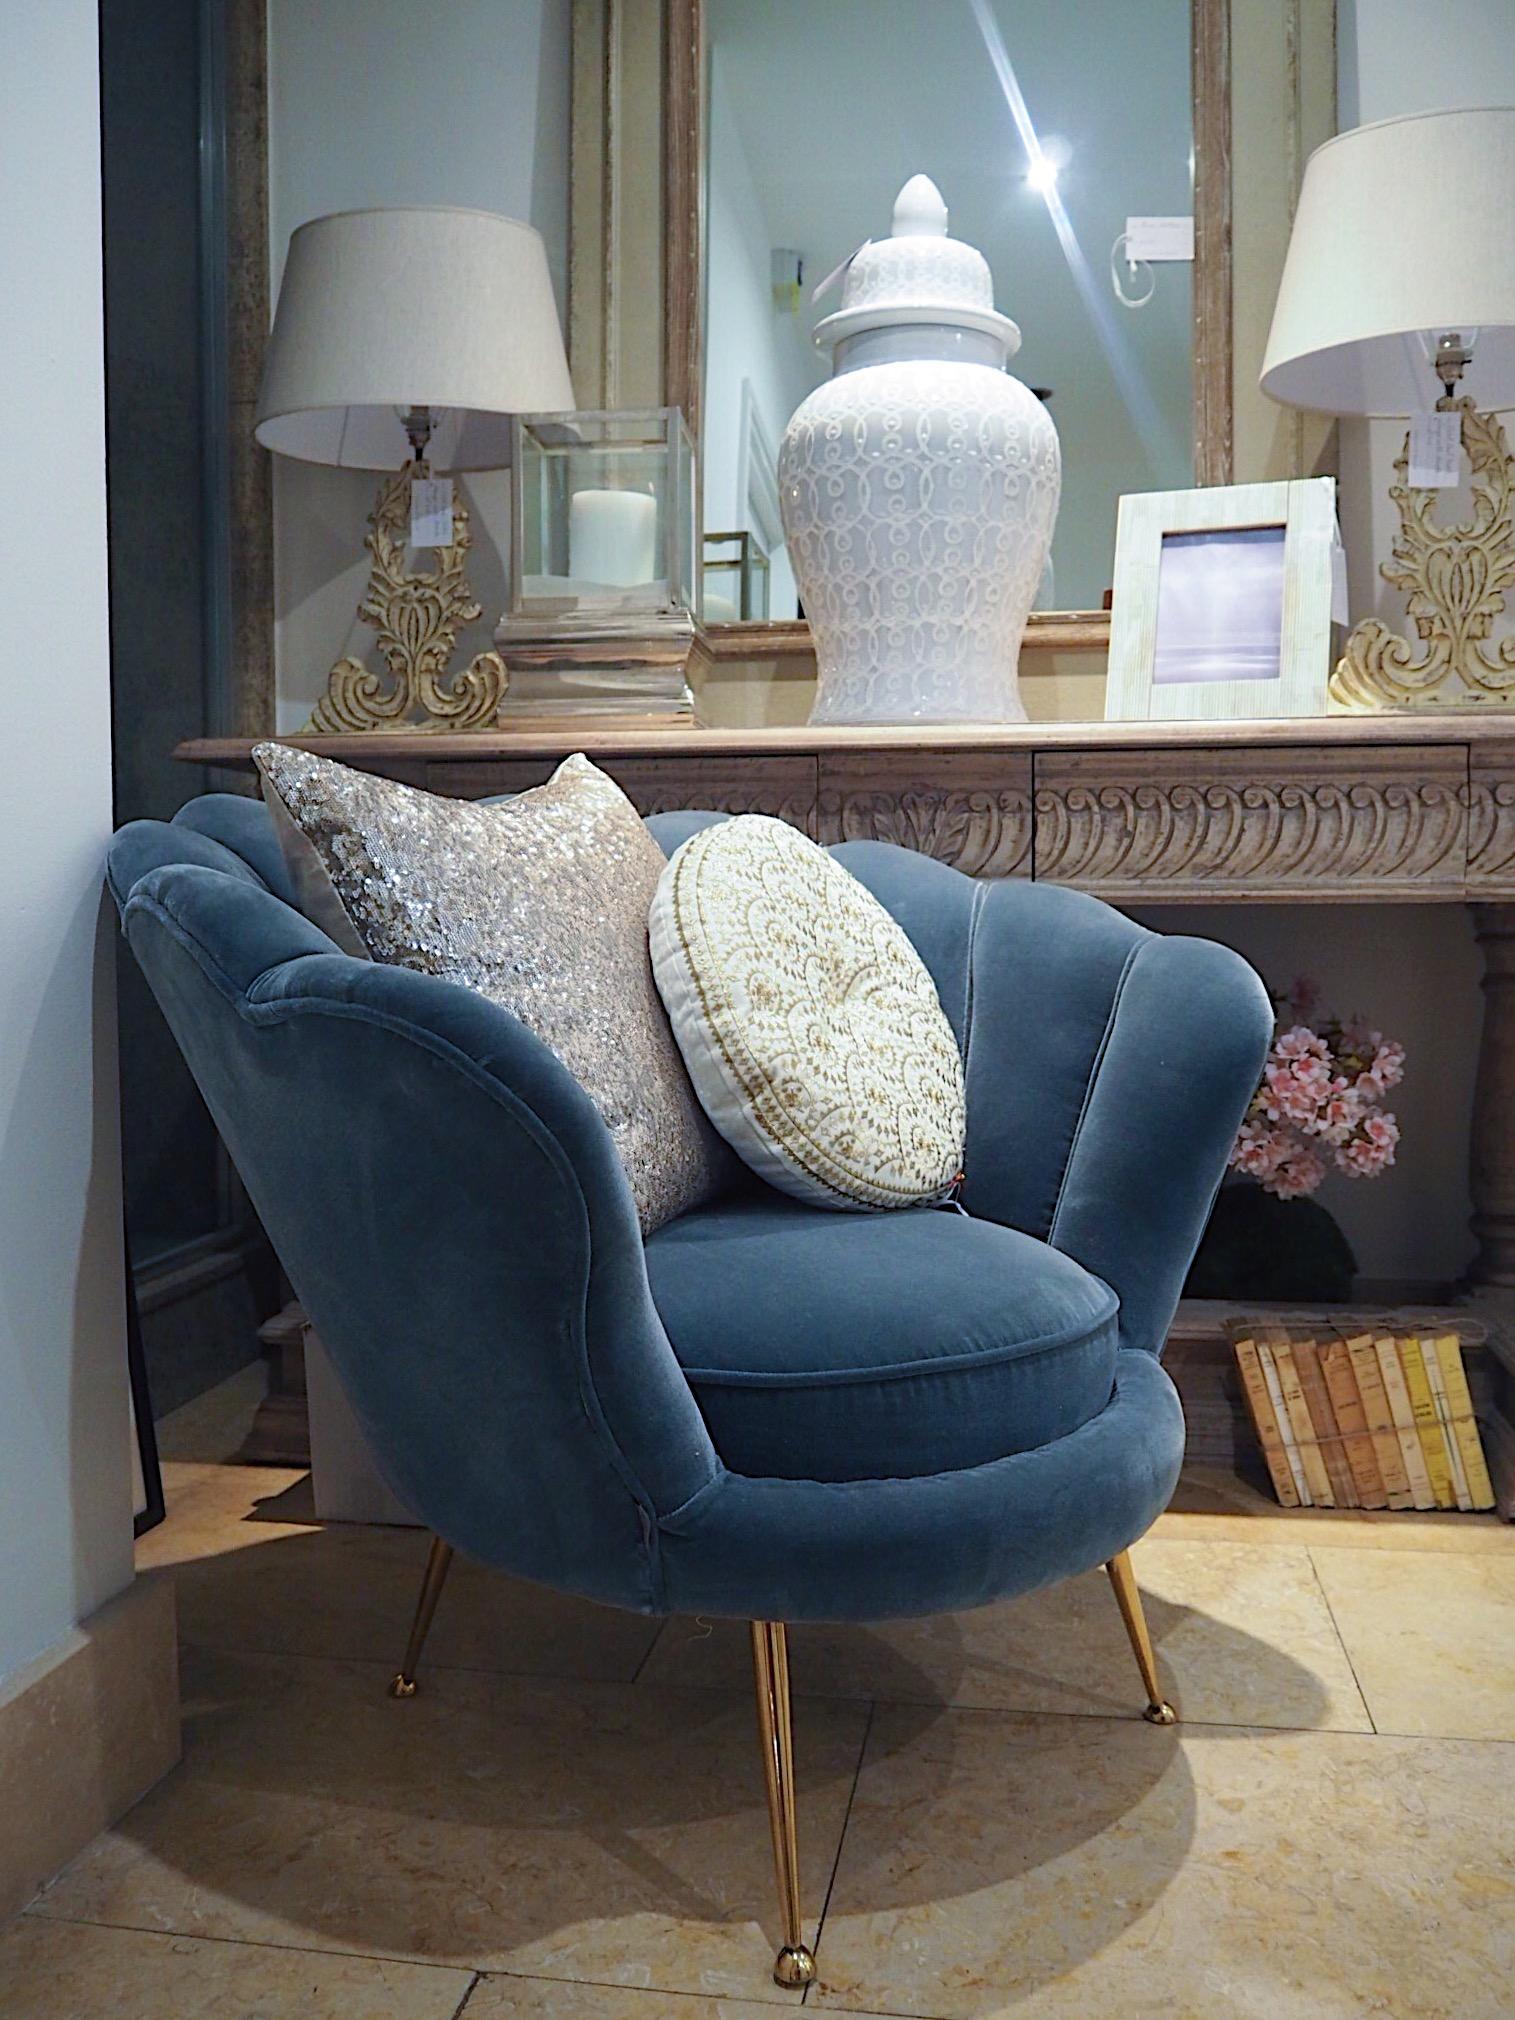 The Eicholtz Trapezium Armchair in blue